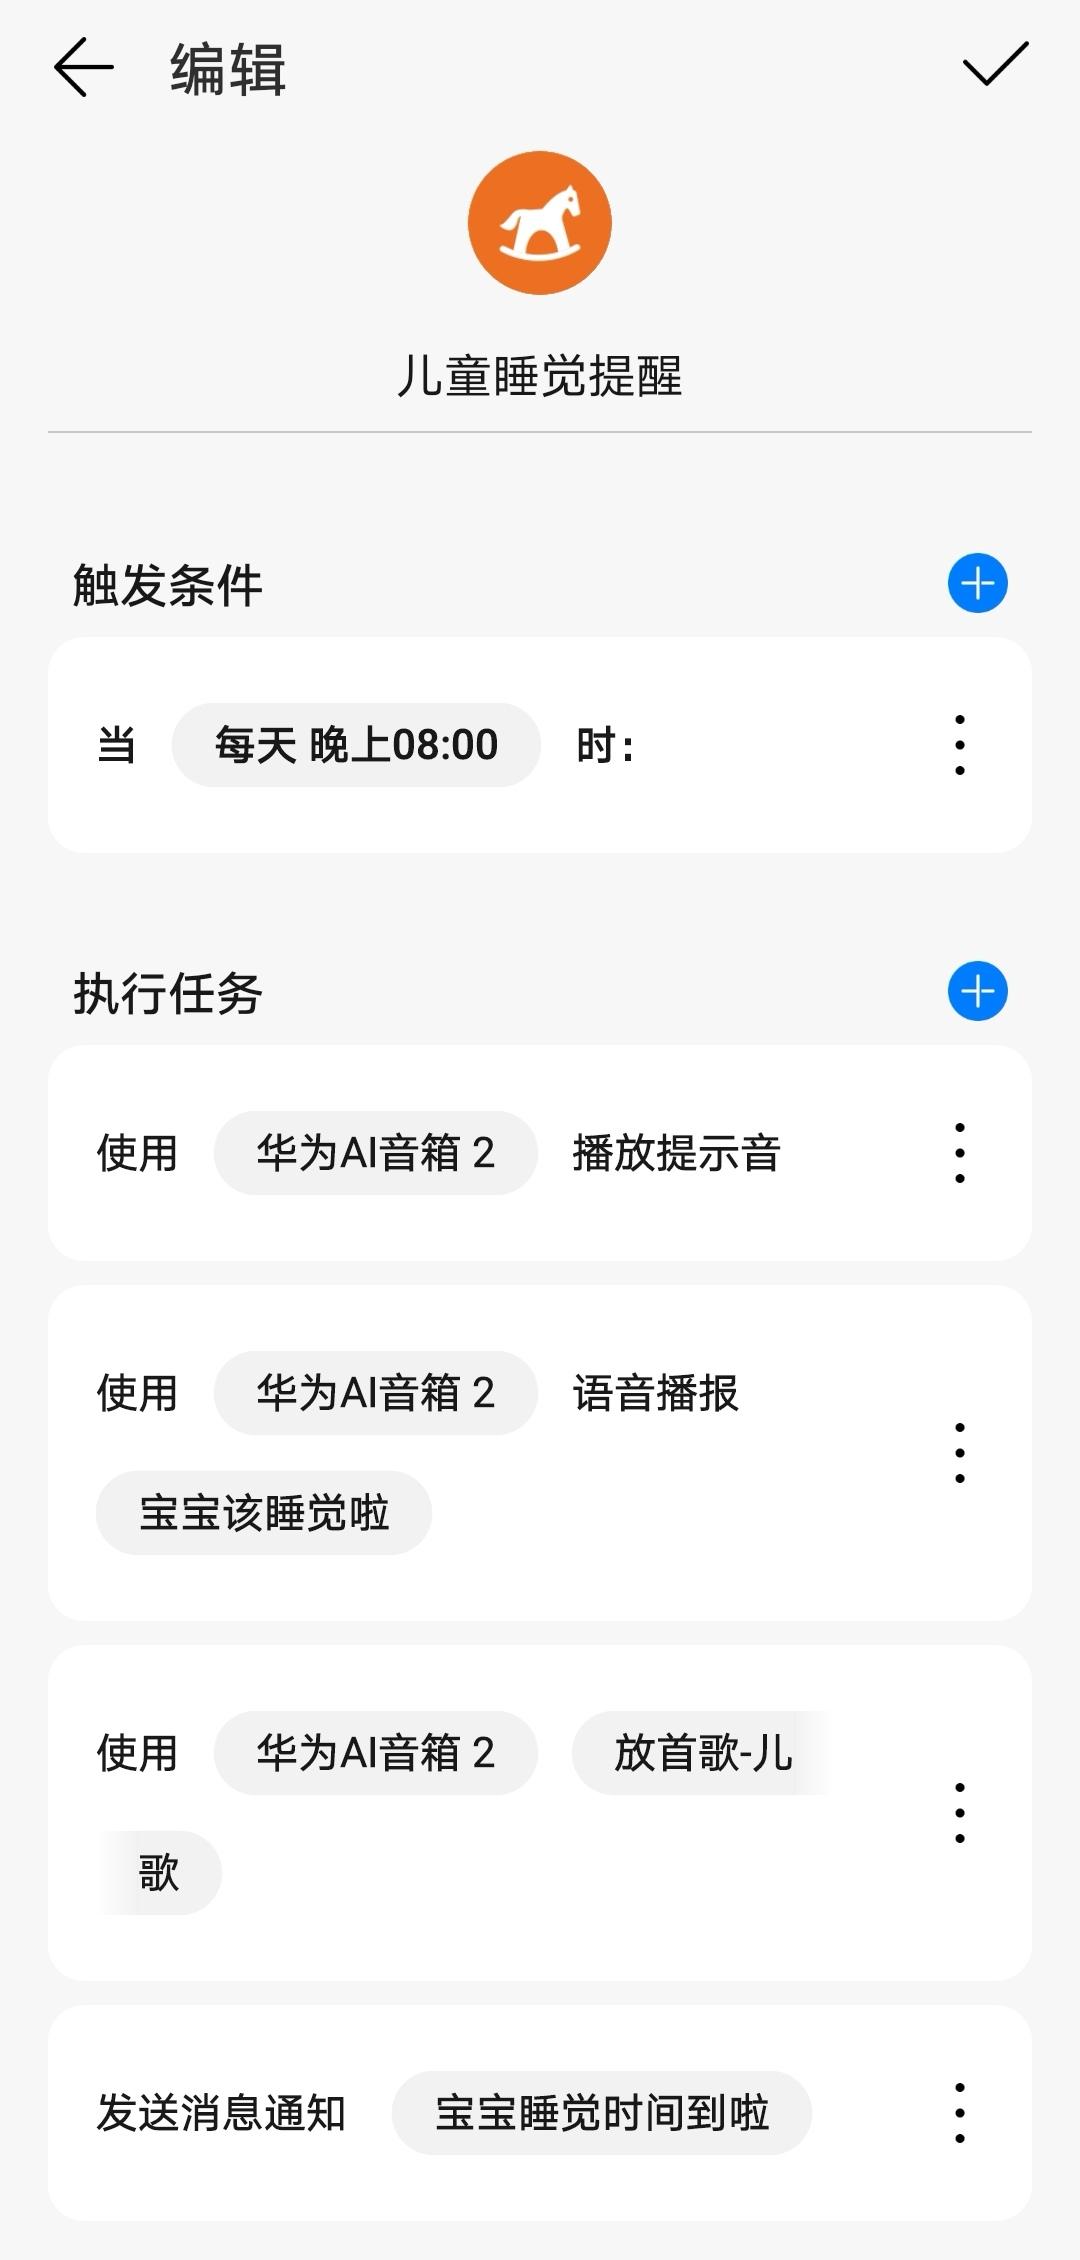 Screenshot_20210403_164458_com.huawei.smarthome_edit_24660071537903.jpg